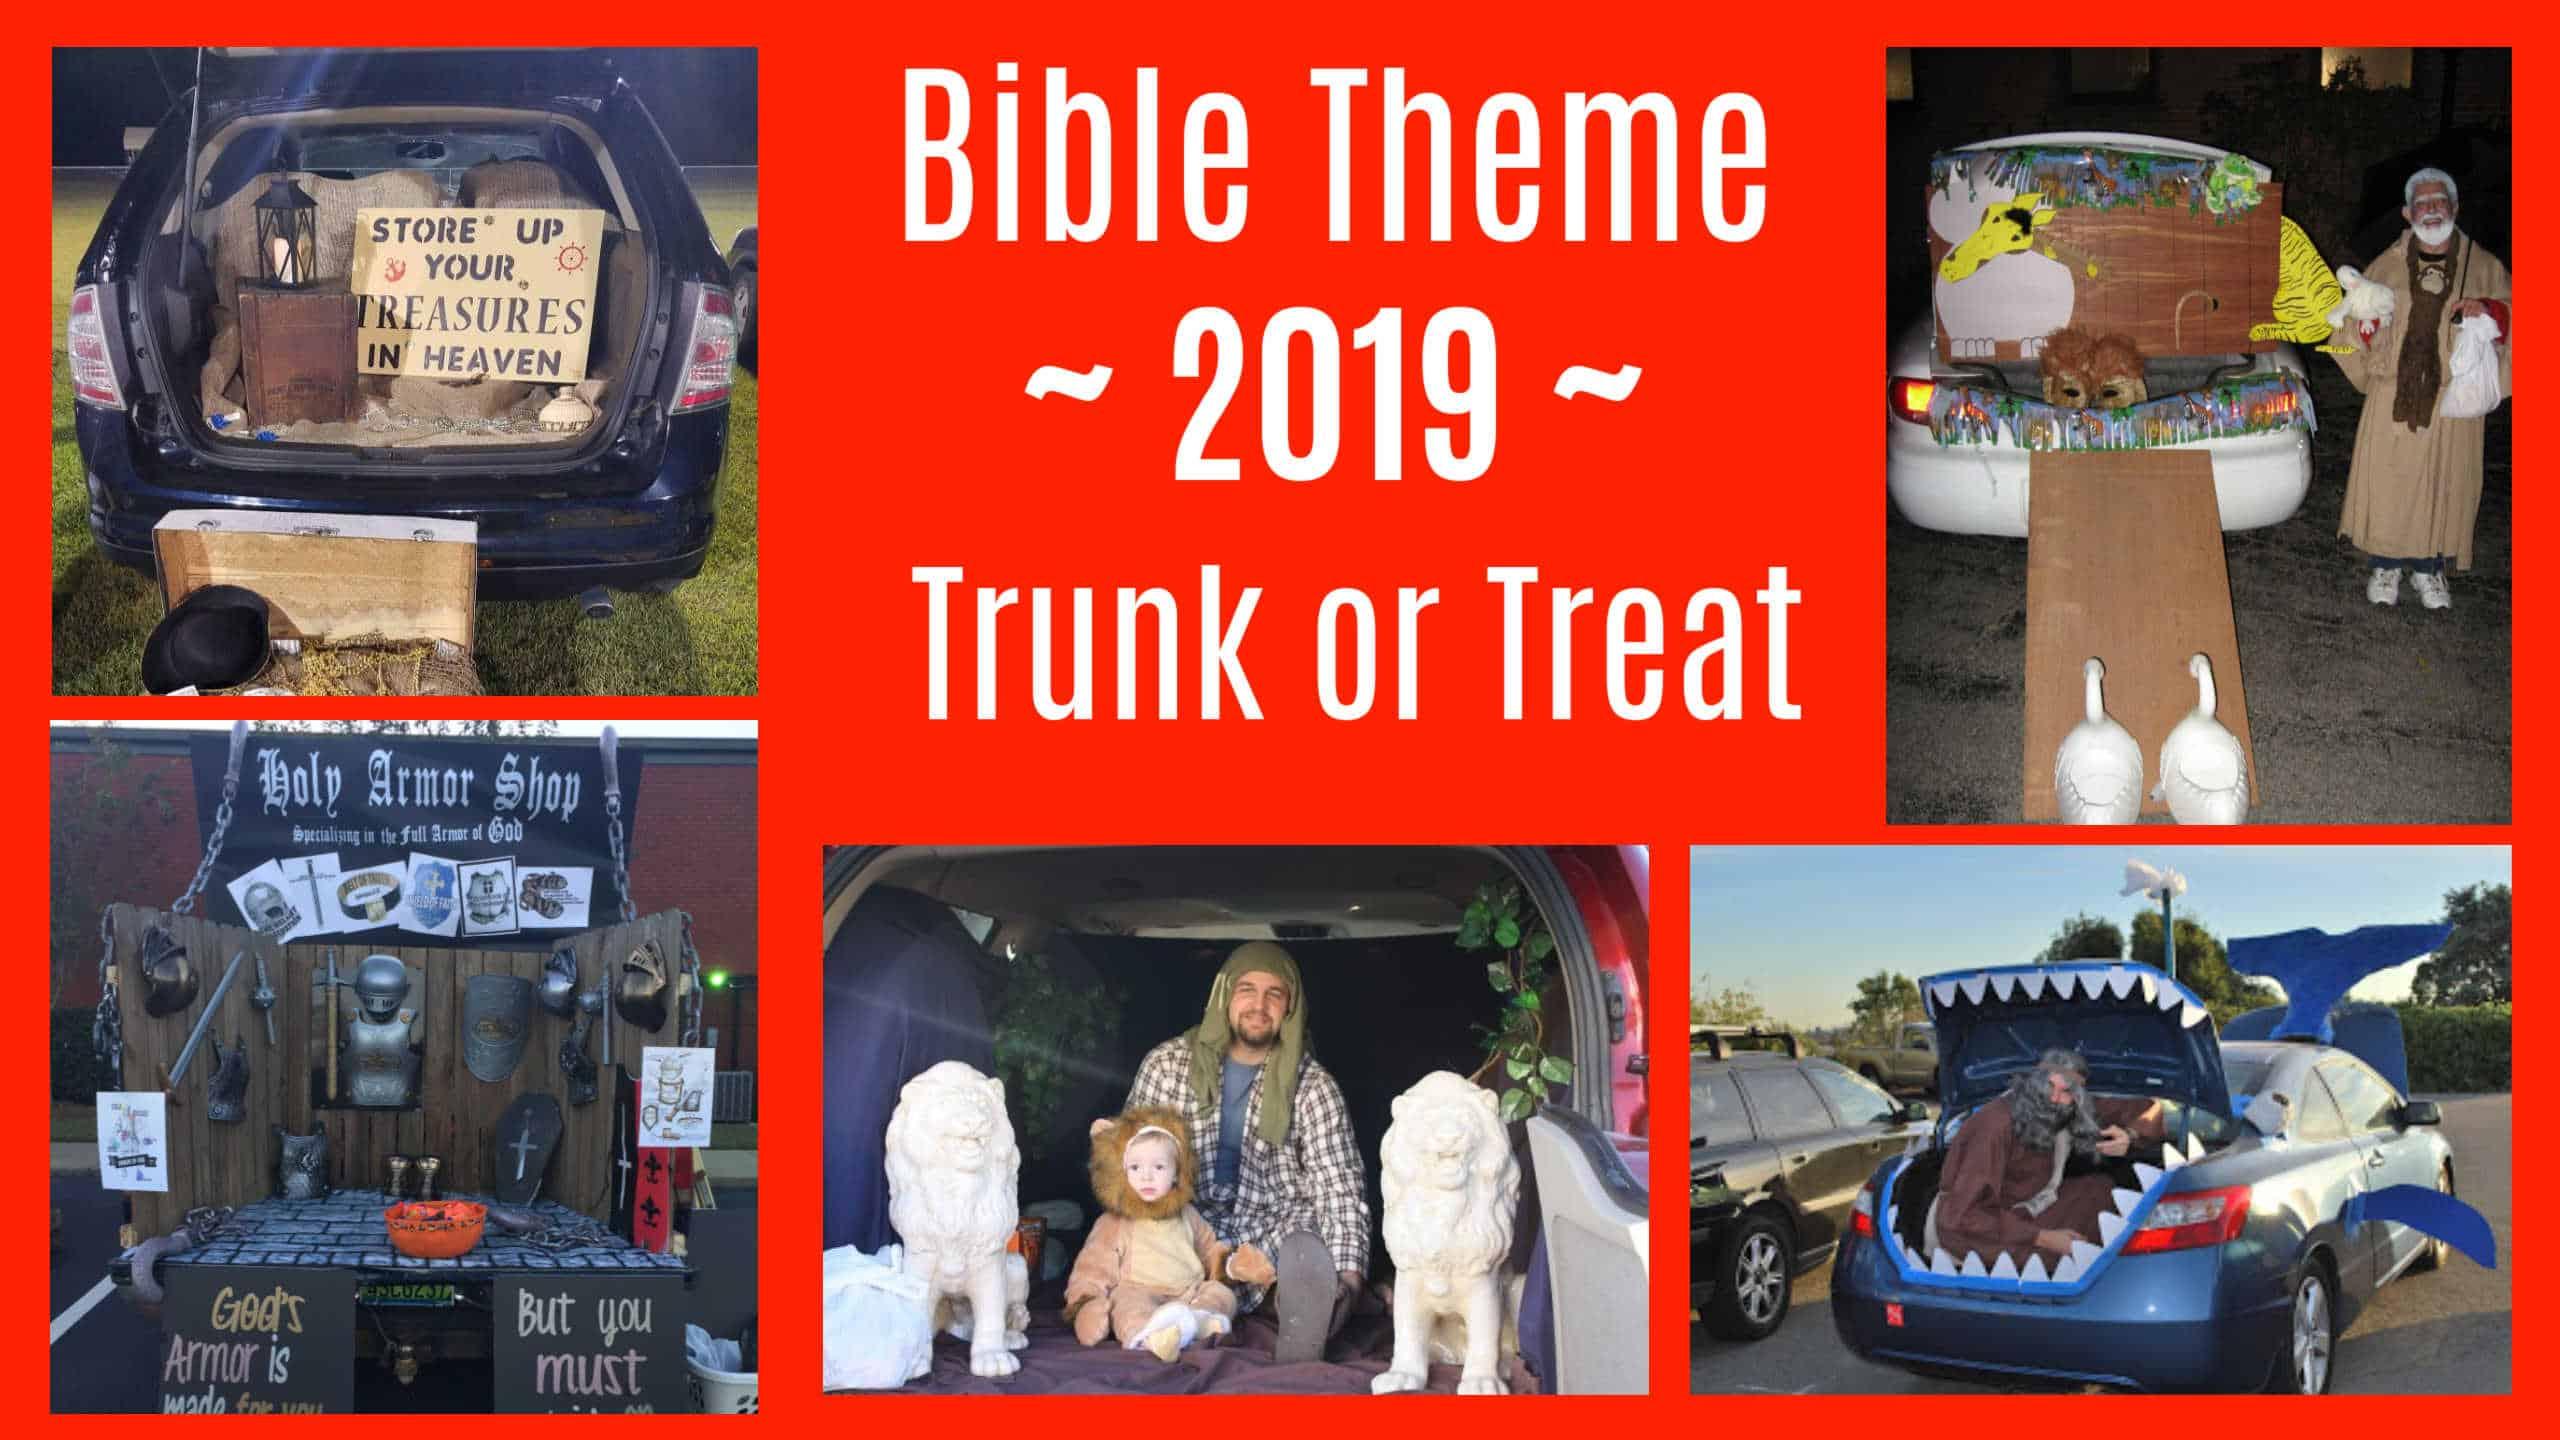 Trunk or Treat Church Christian Halloween Alternative Ideas